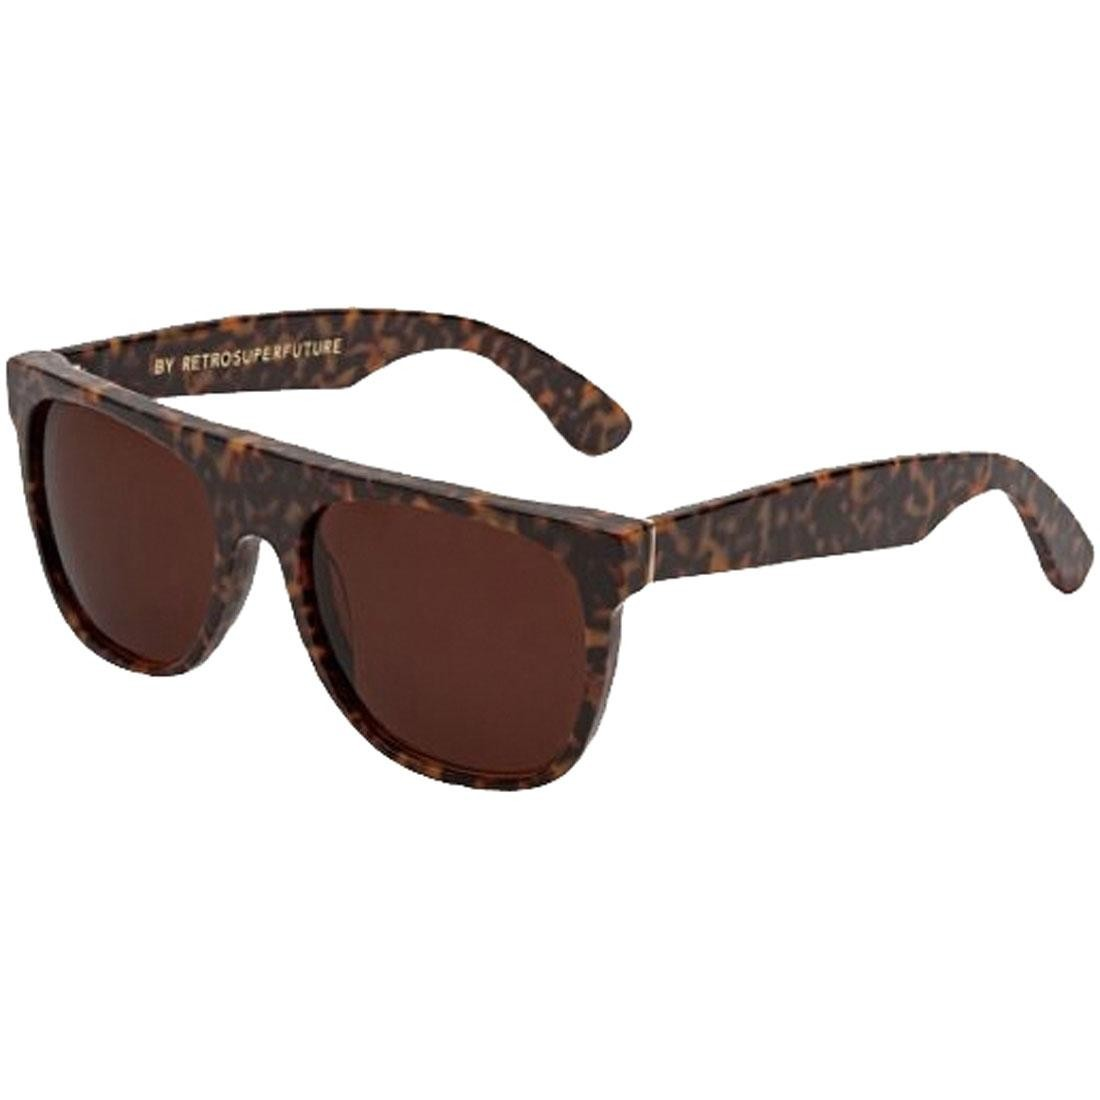 Super Sunglasses Flat Top Sunglasses (brown / havana)